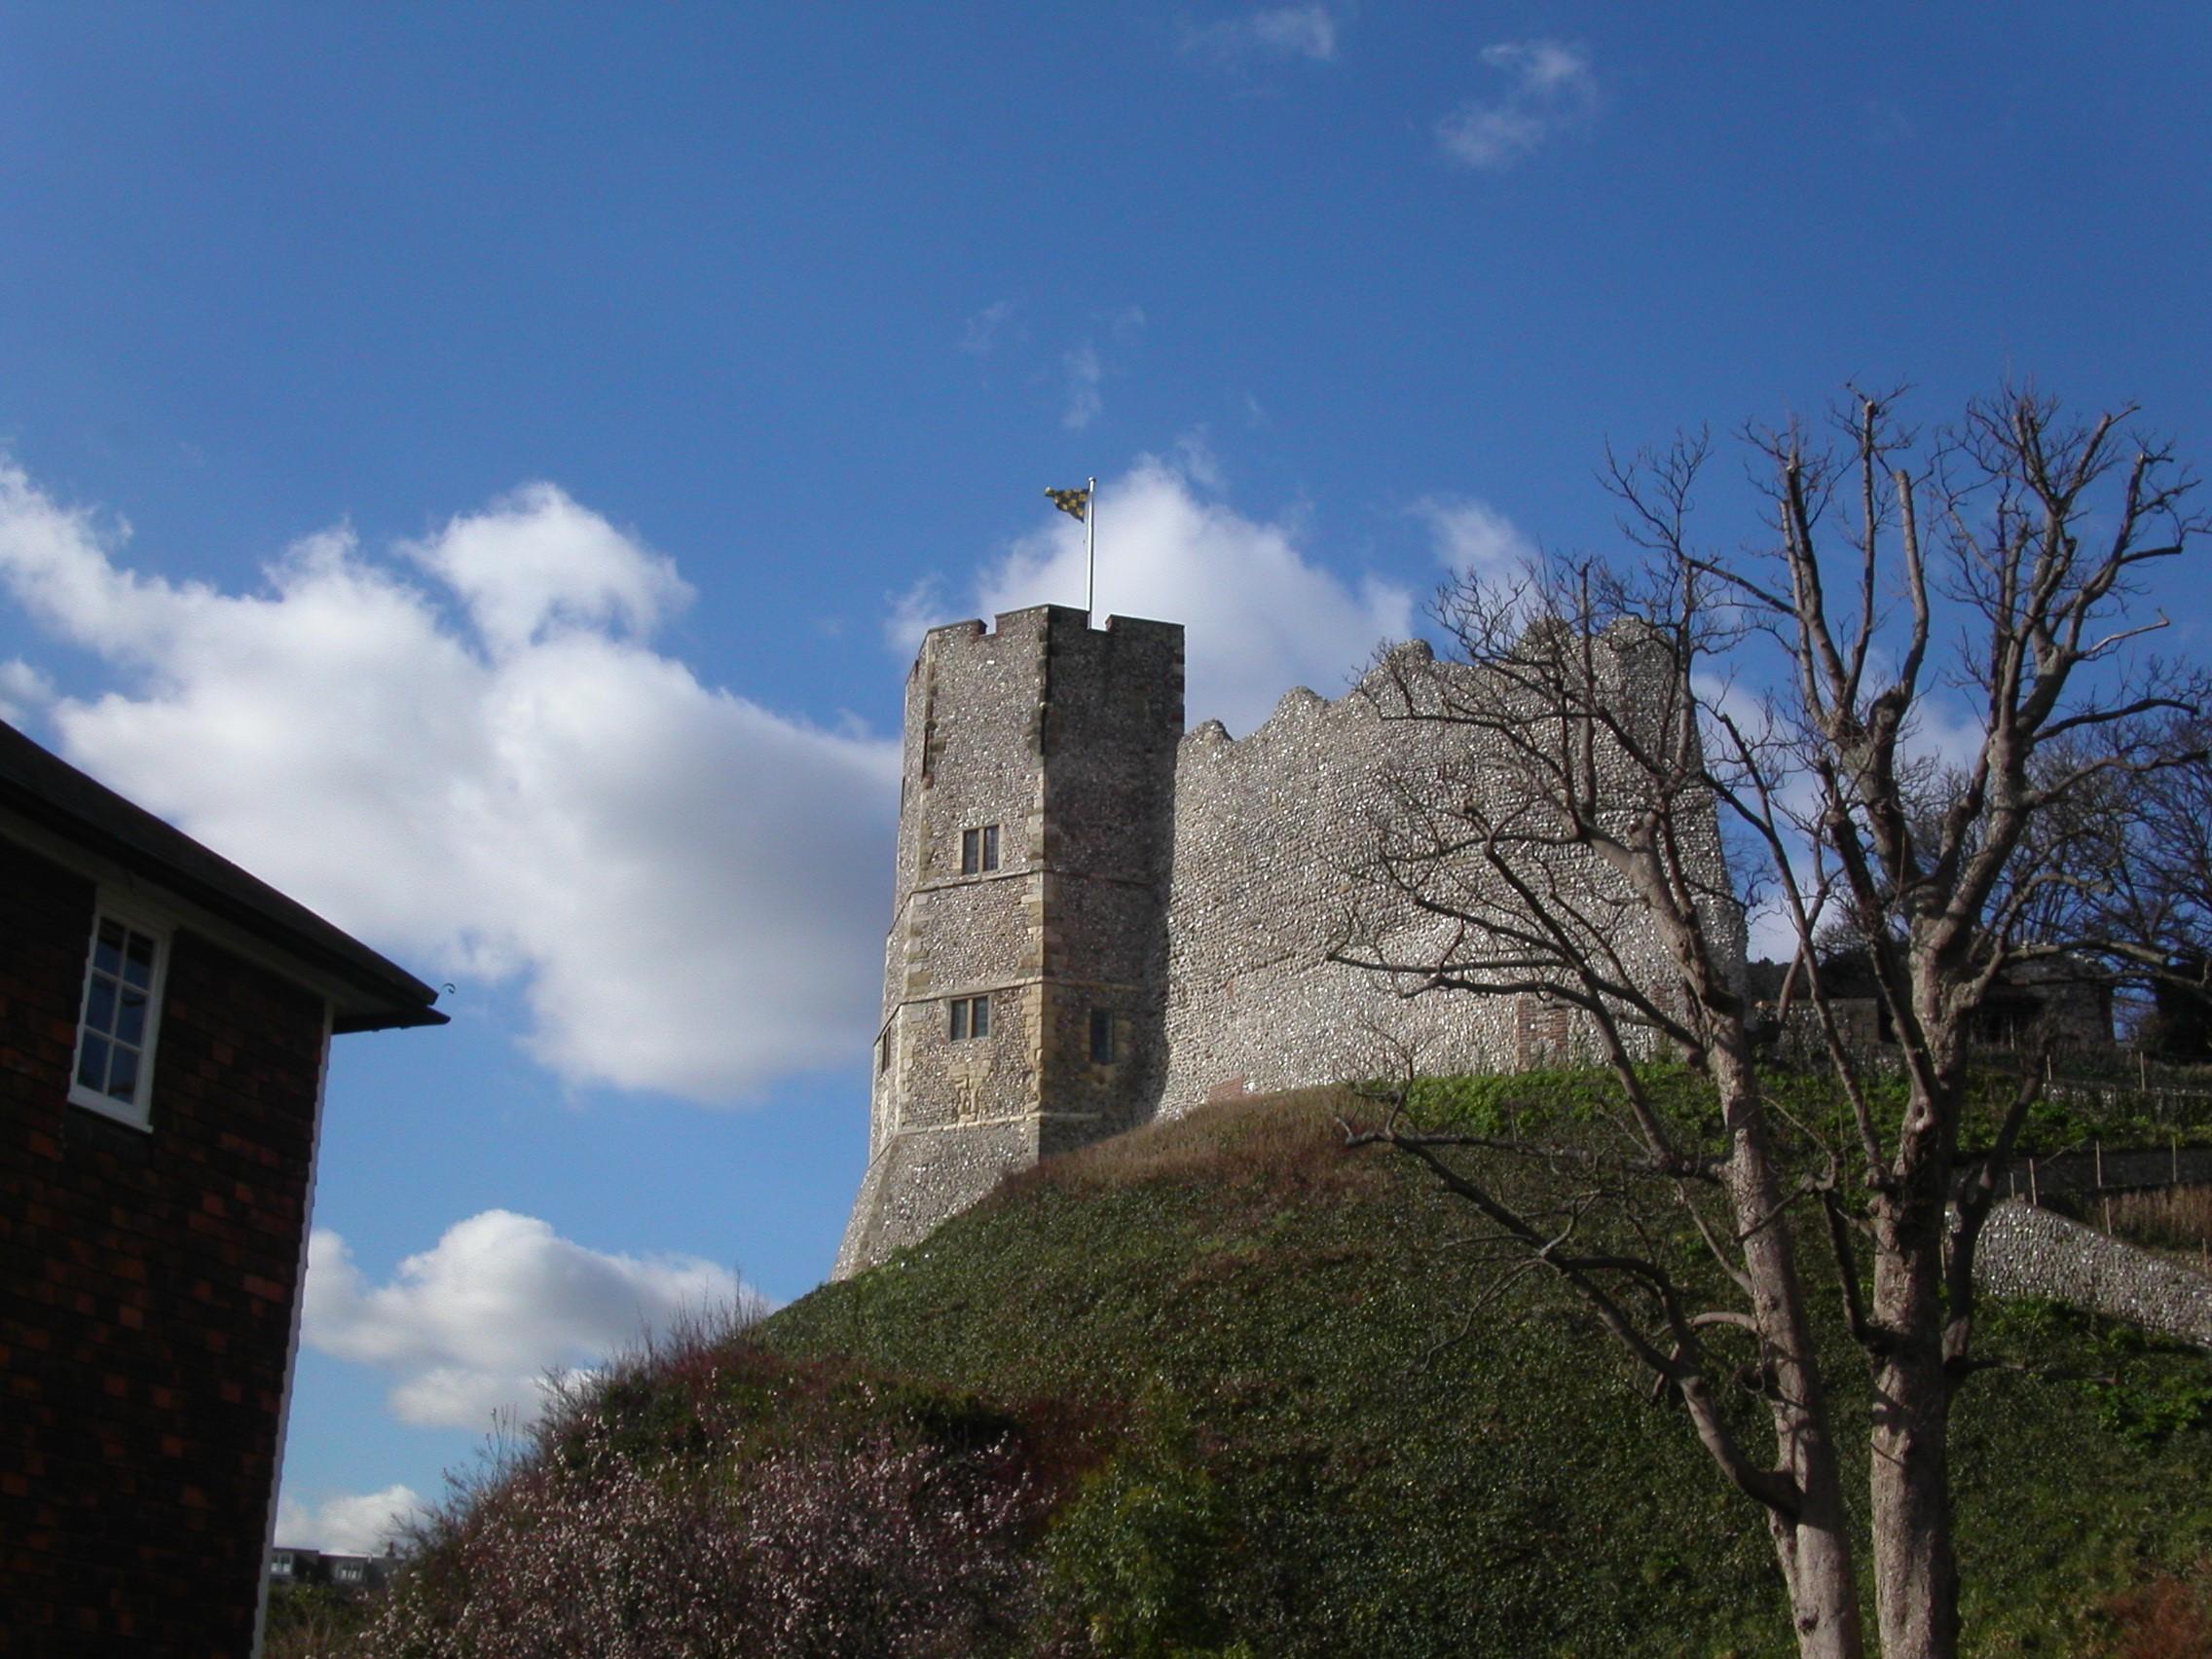 KS2 & KS3 visit to Lewes Castle